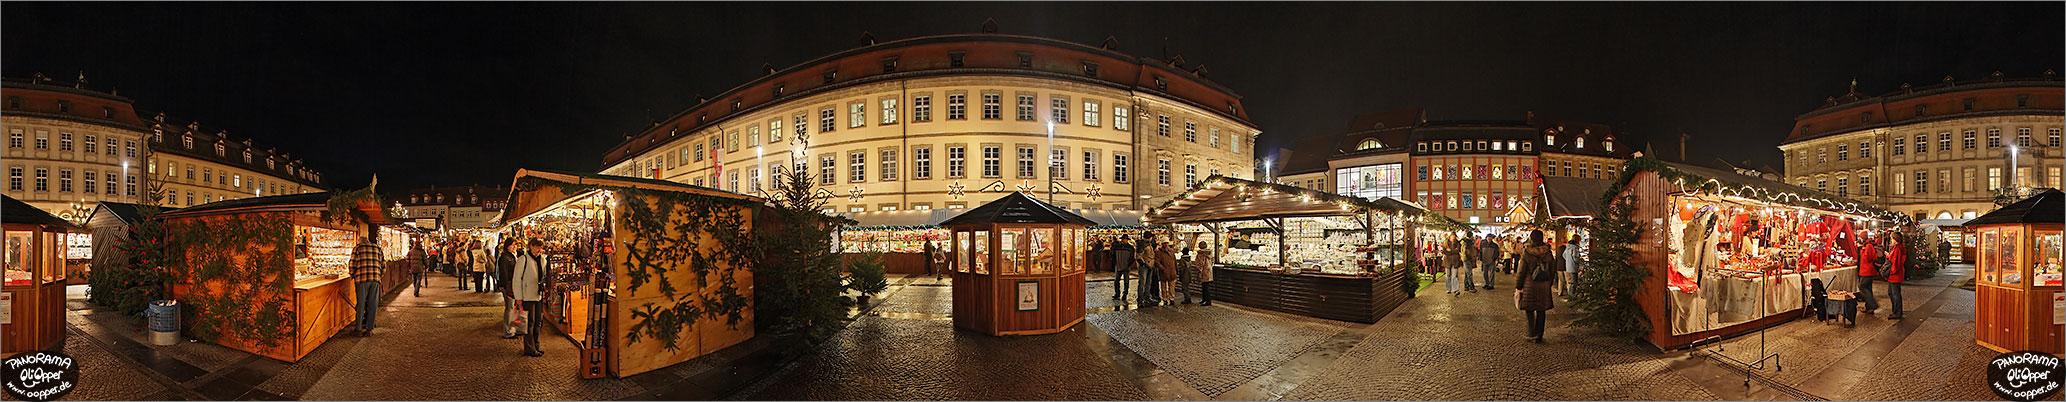 Weihnachtsmarkt Bamberg - Maximiliansplatz - p014 - (c) by Oliver Opper